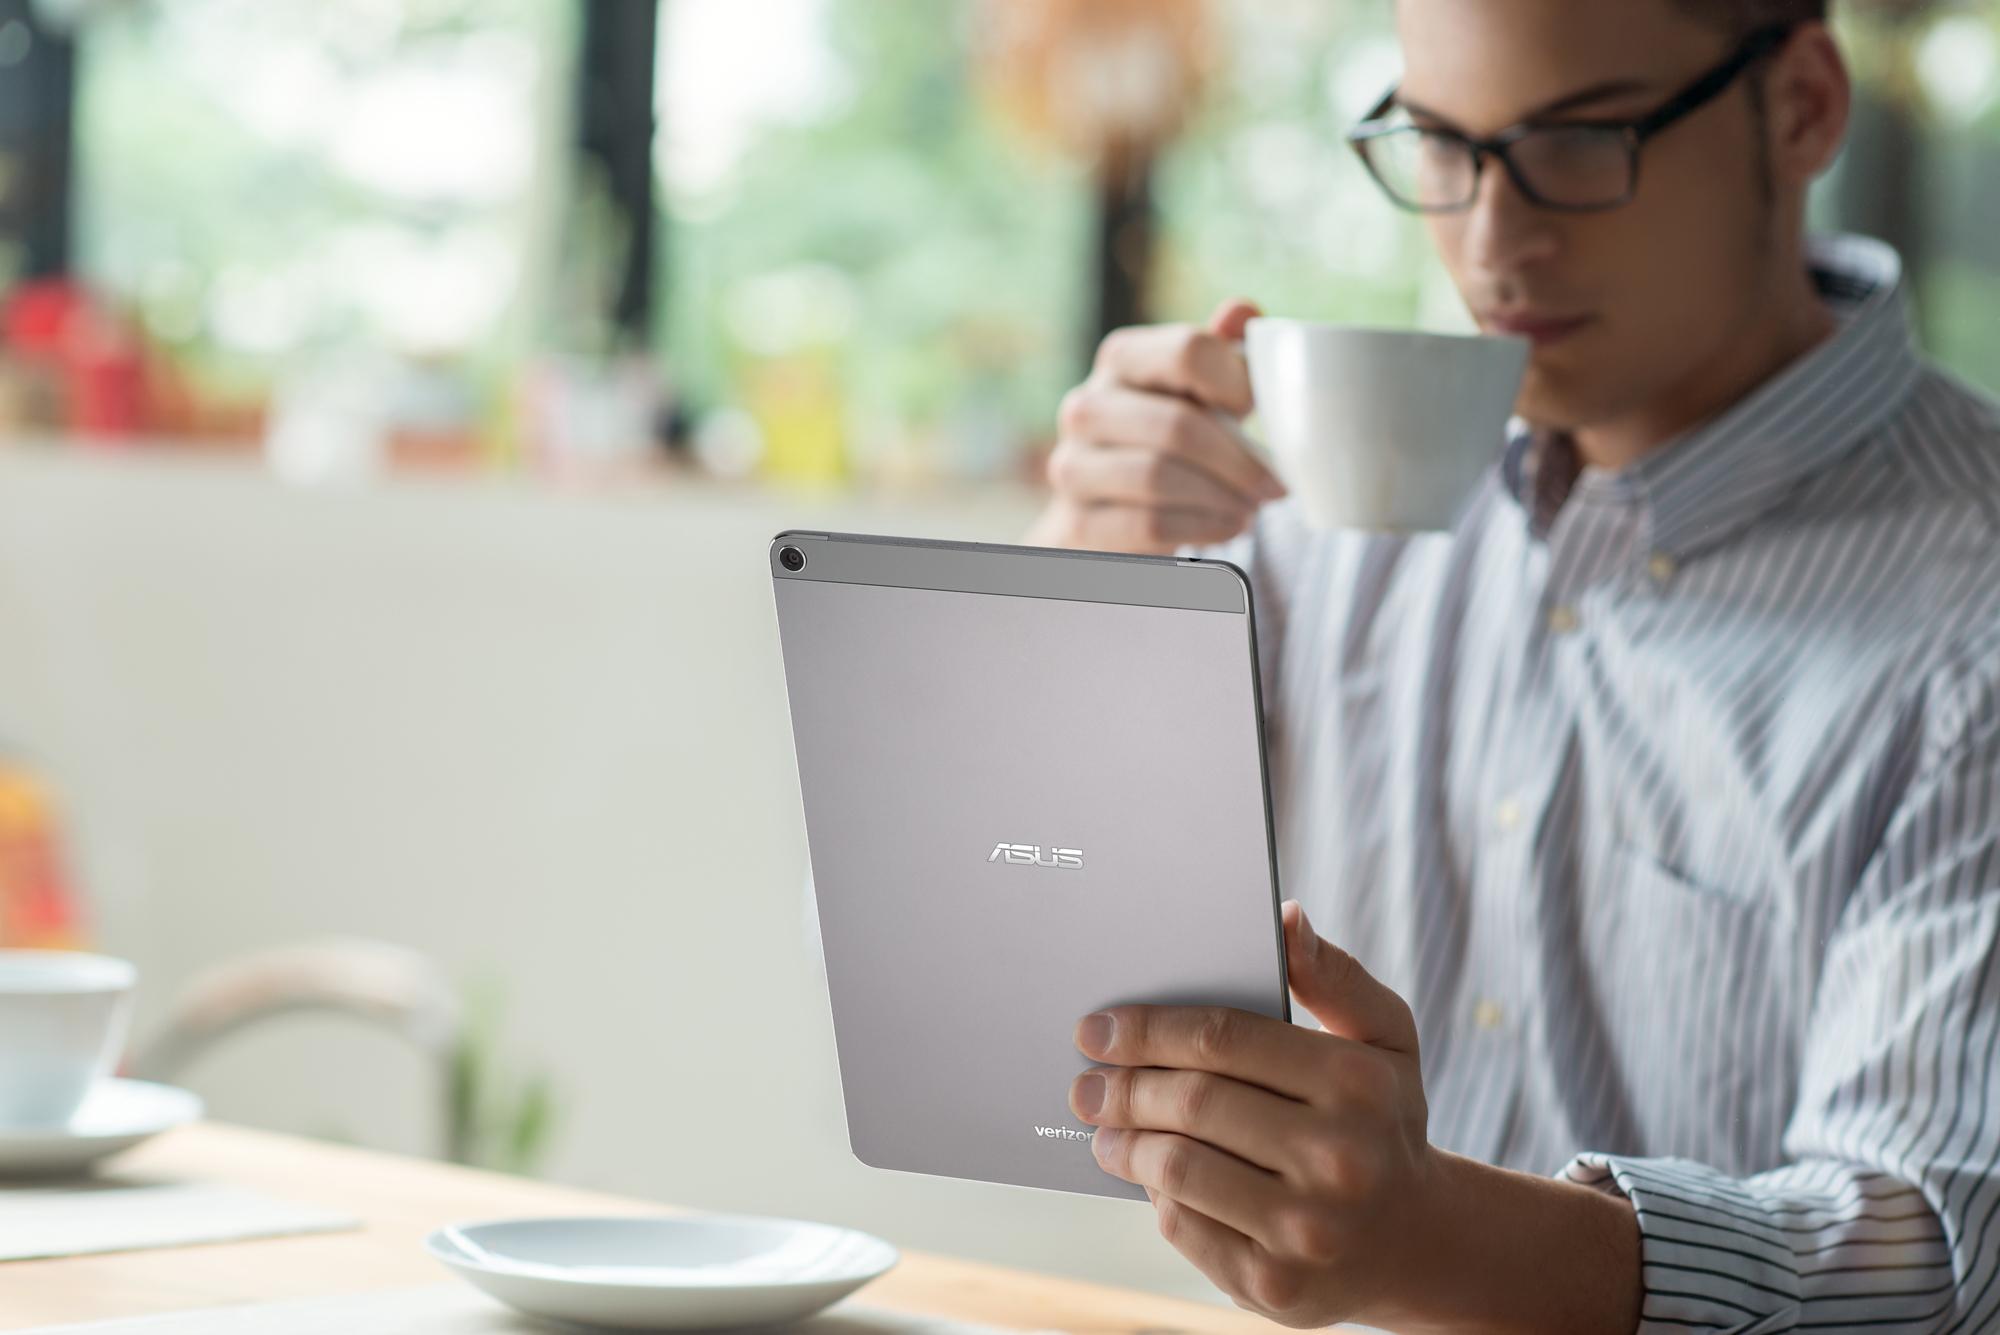 ASUS ZenPad™ Z10 tablet